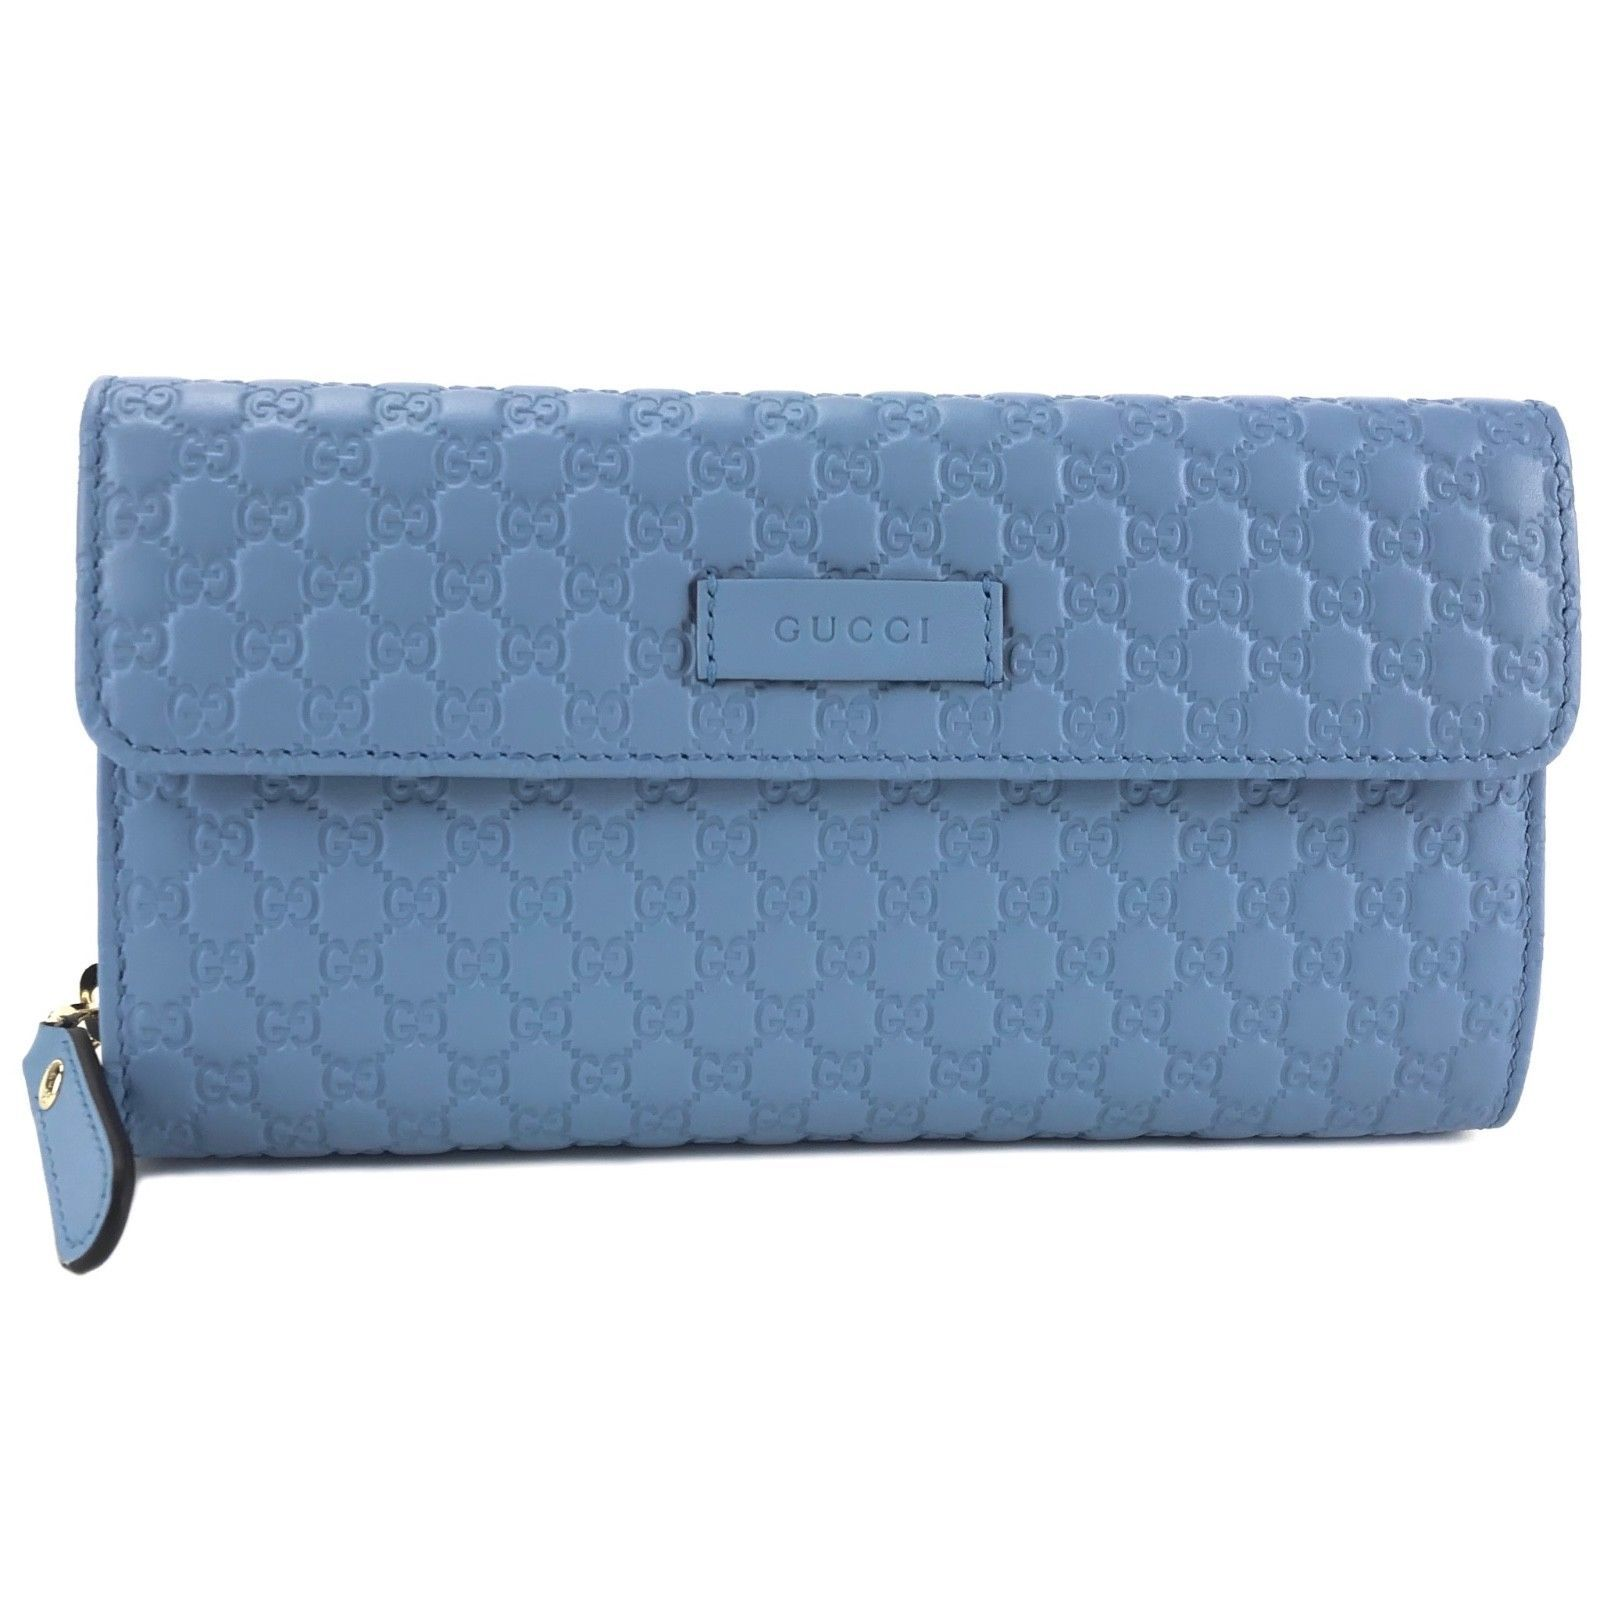 7d0c4643e410 GUCCI 449364 Microguccissima Blue Leather and 50 similar items. S l1600